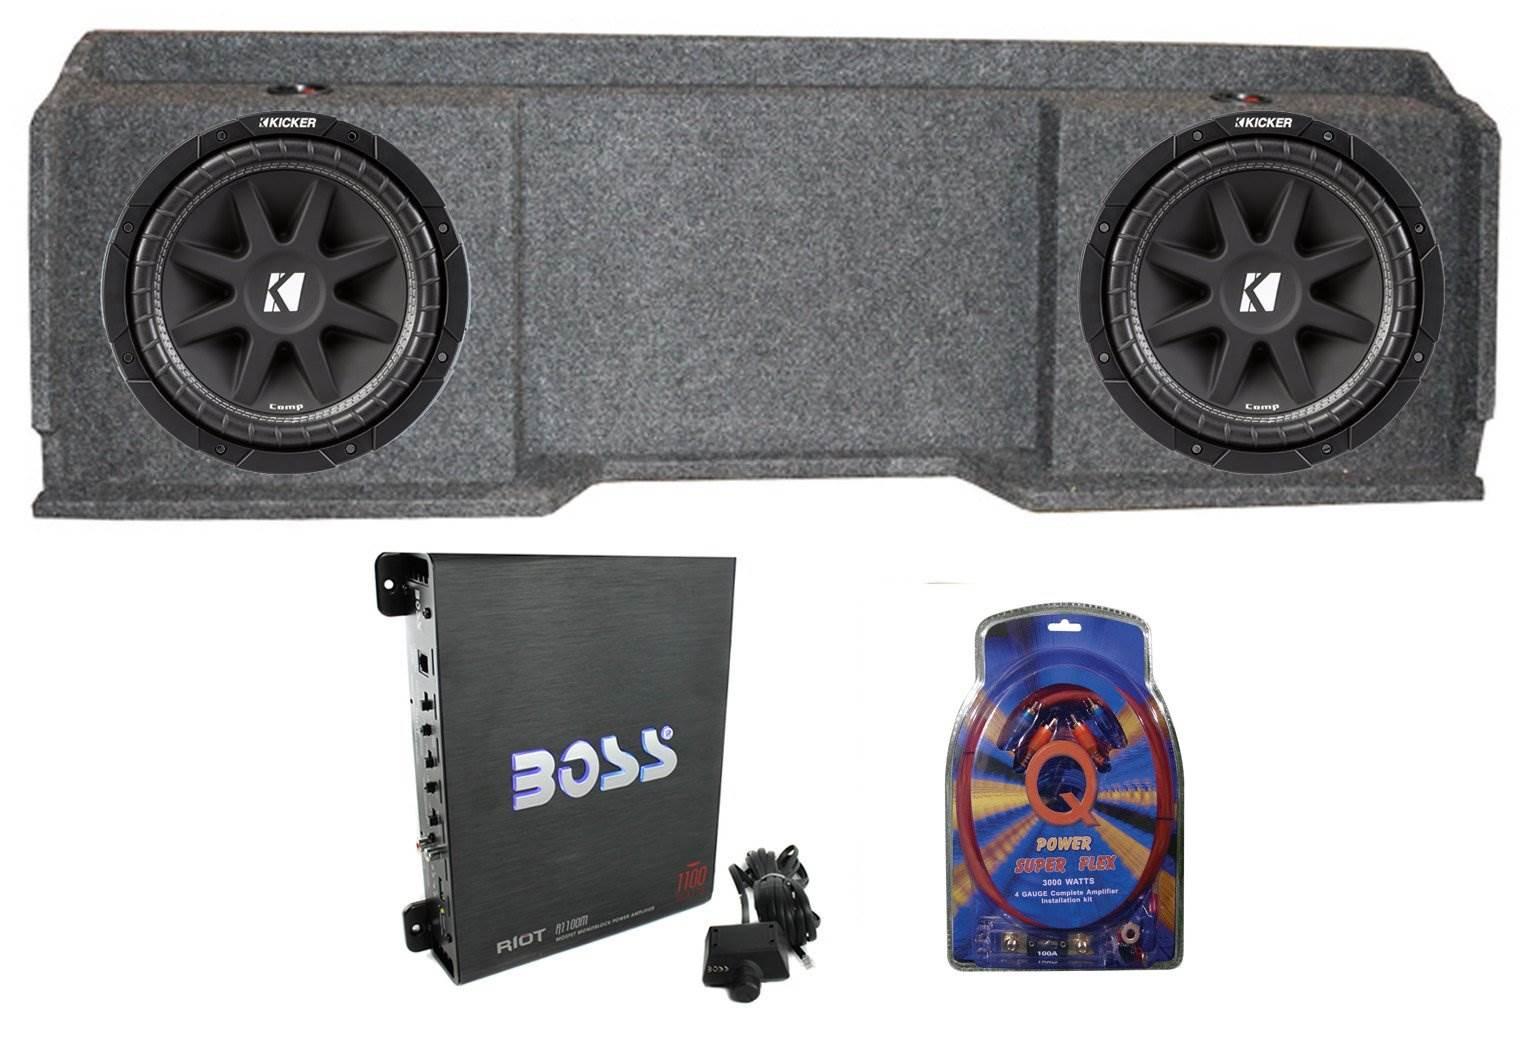 Amplifier+Amp Kit KICKER 43TC104 Comp 10 Subwoofer in Sub Box Enclosure+2-Ch